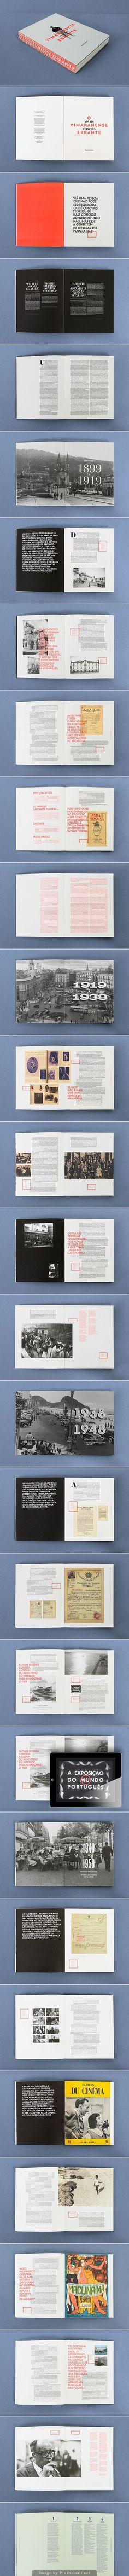 "Interactive printing Book ""O Vimaranense Errante"" - Atelier Martino & Jana:"